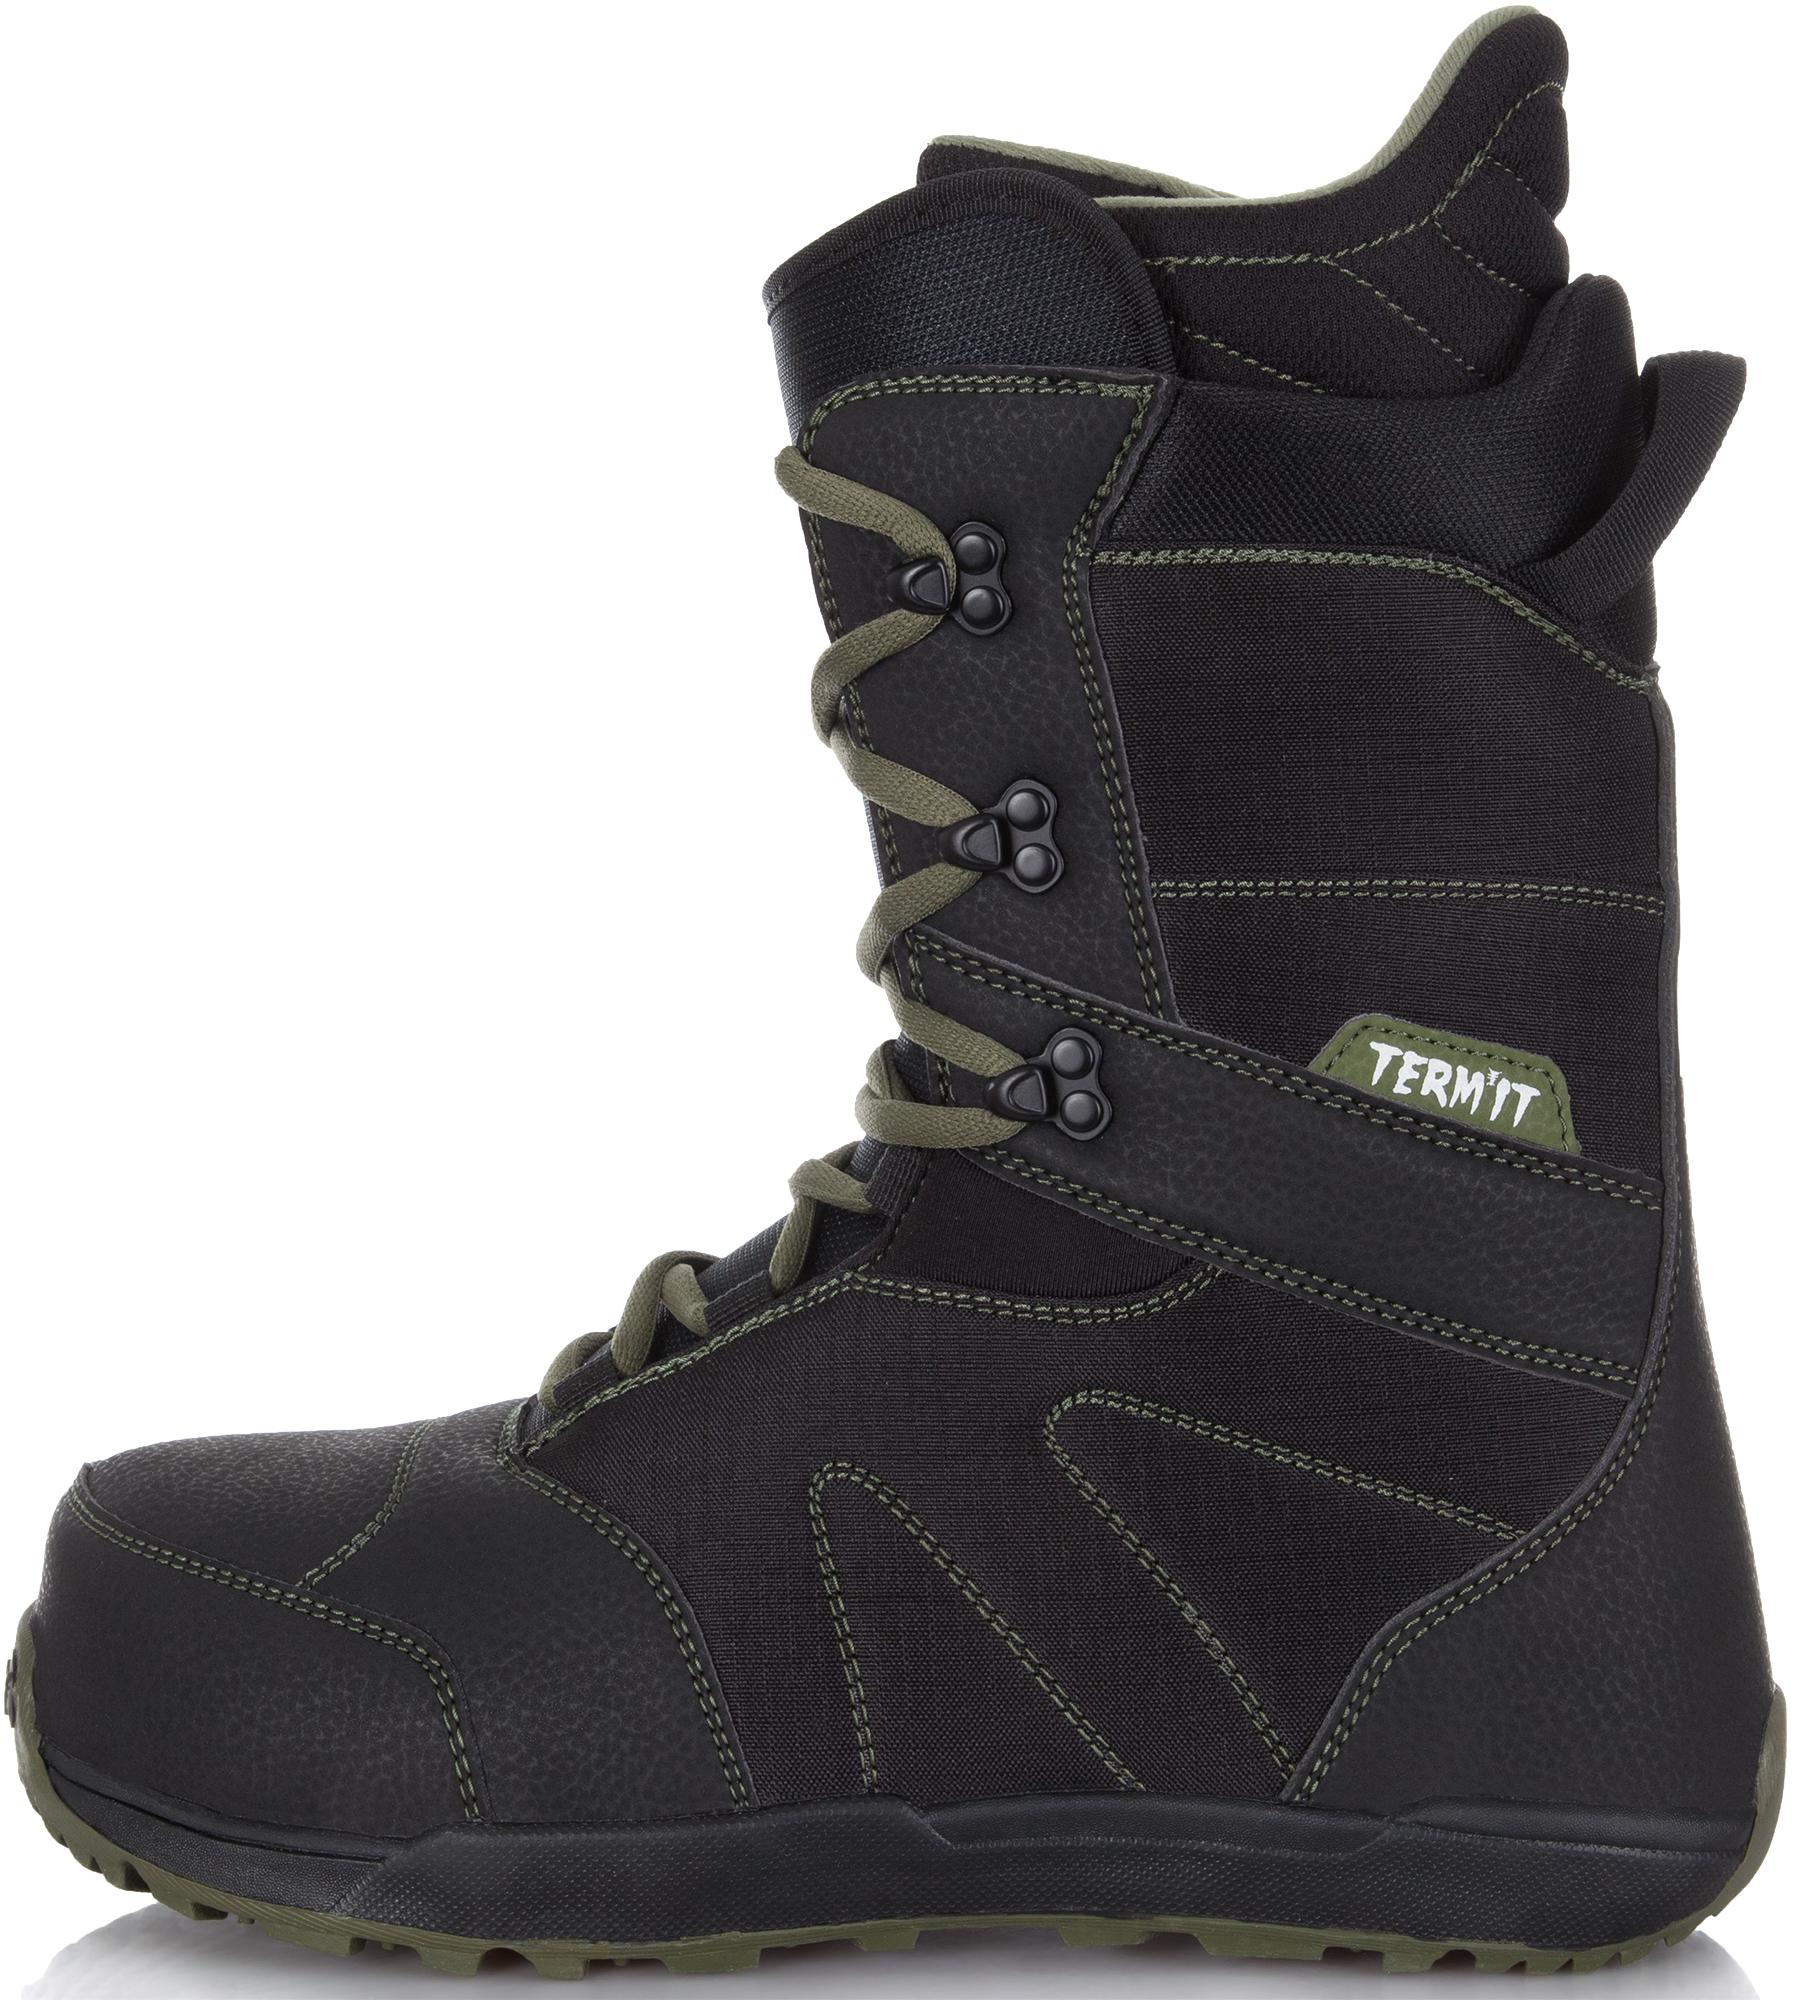 Termit Сноубордические ботинки Termit Symbol, размер 44